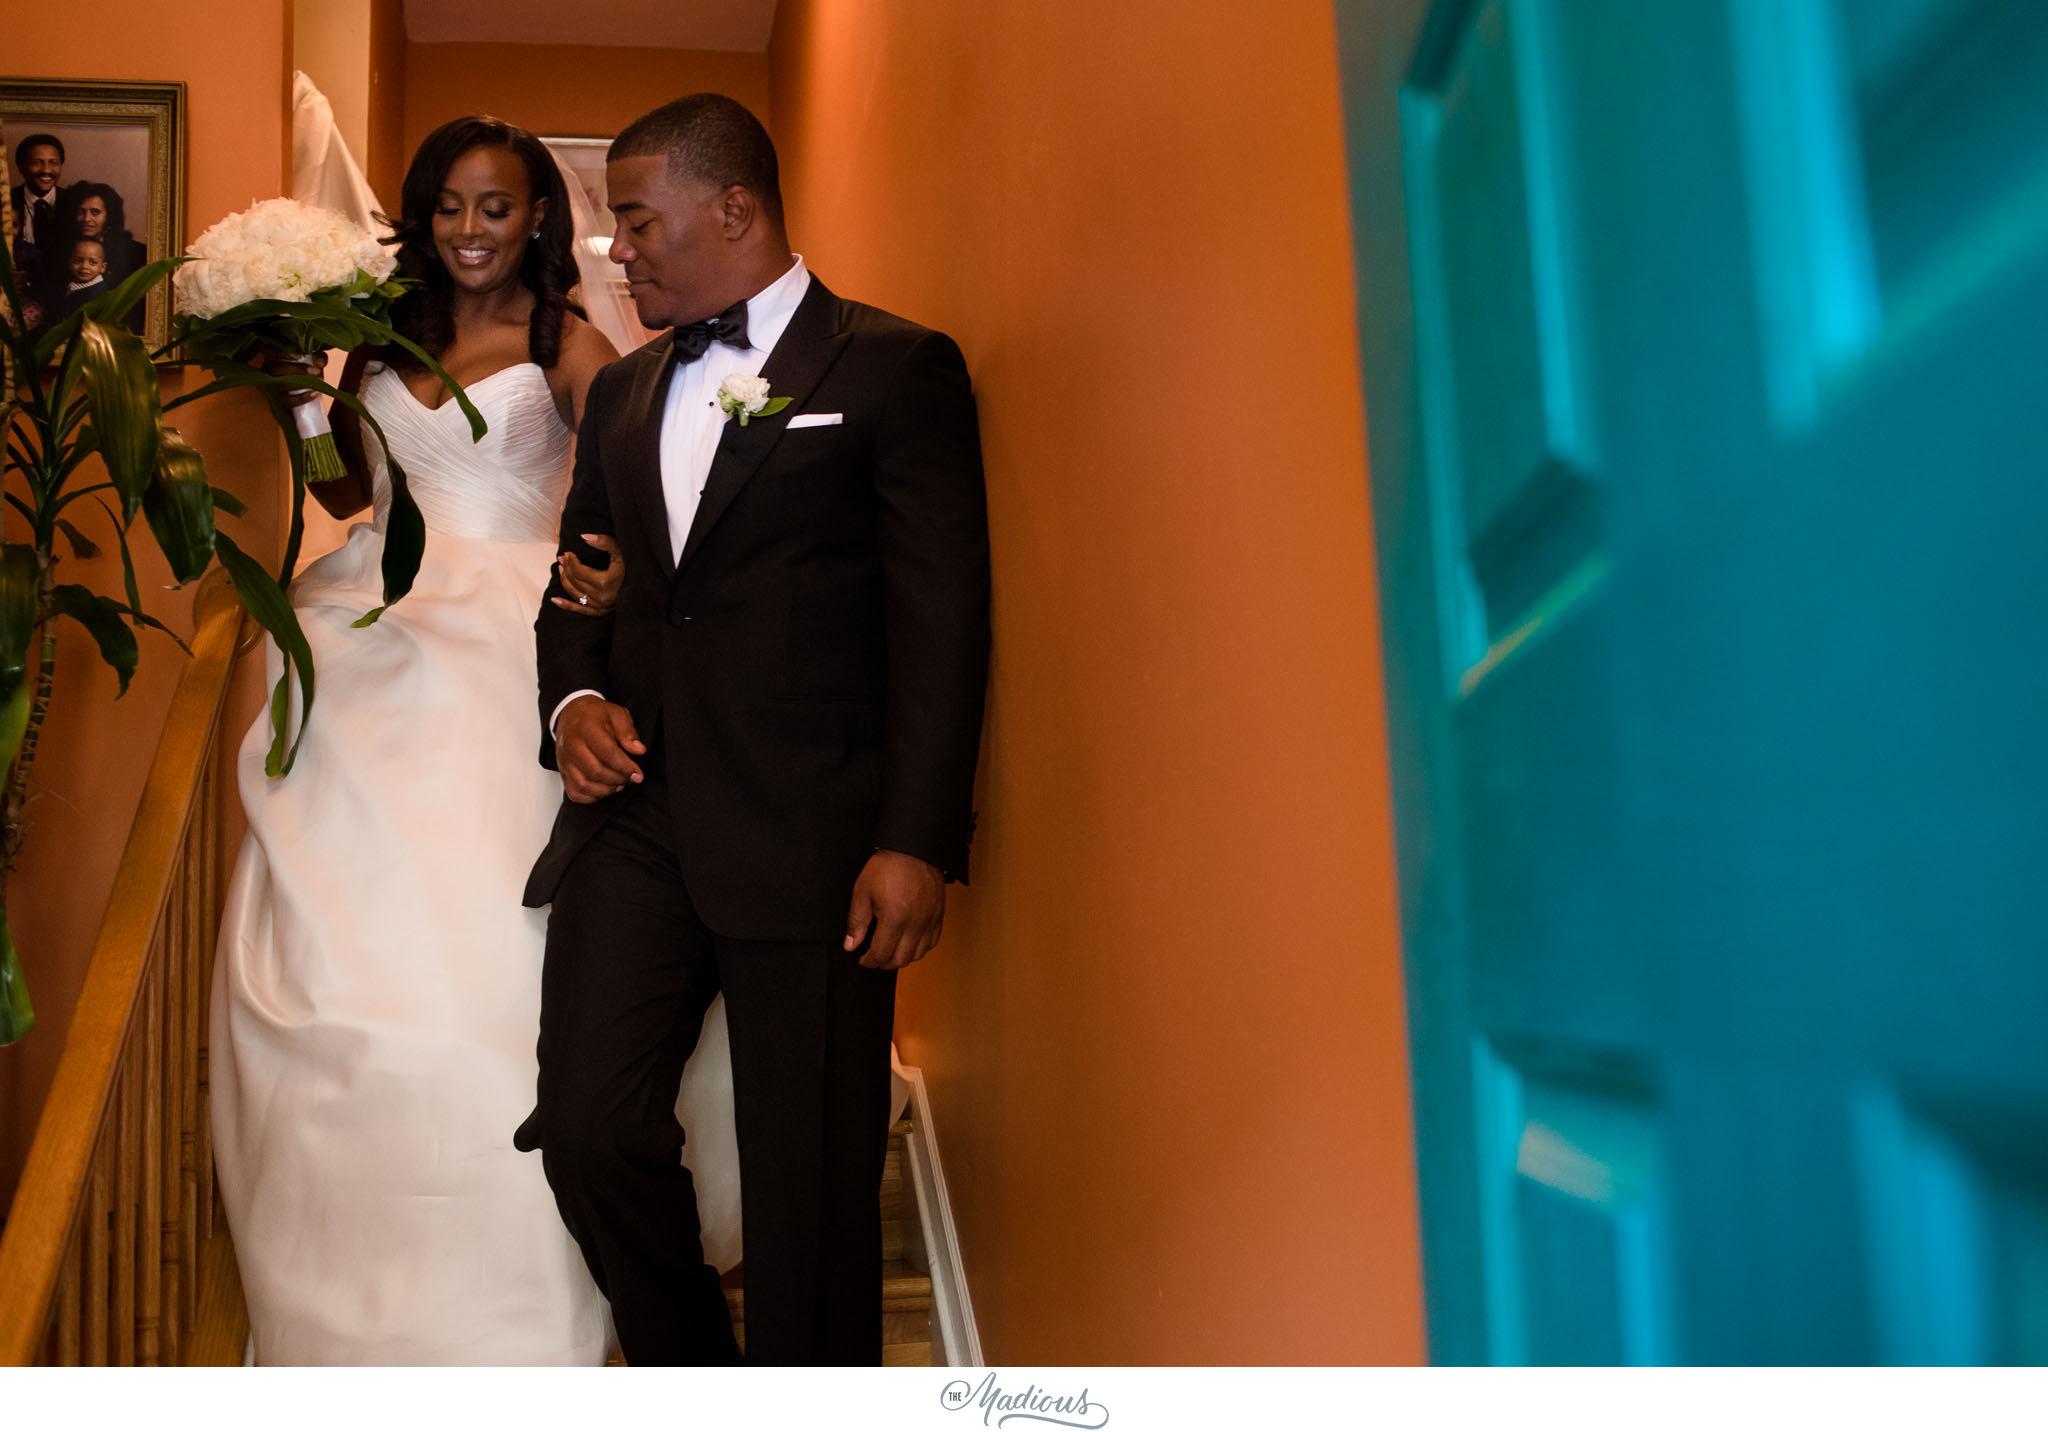 nmwa+wedding,+women+in+the+arts+wedding,+ethiopian+wedding,+dc+wedding+0055.jpg